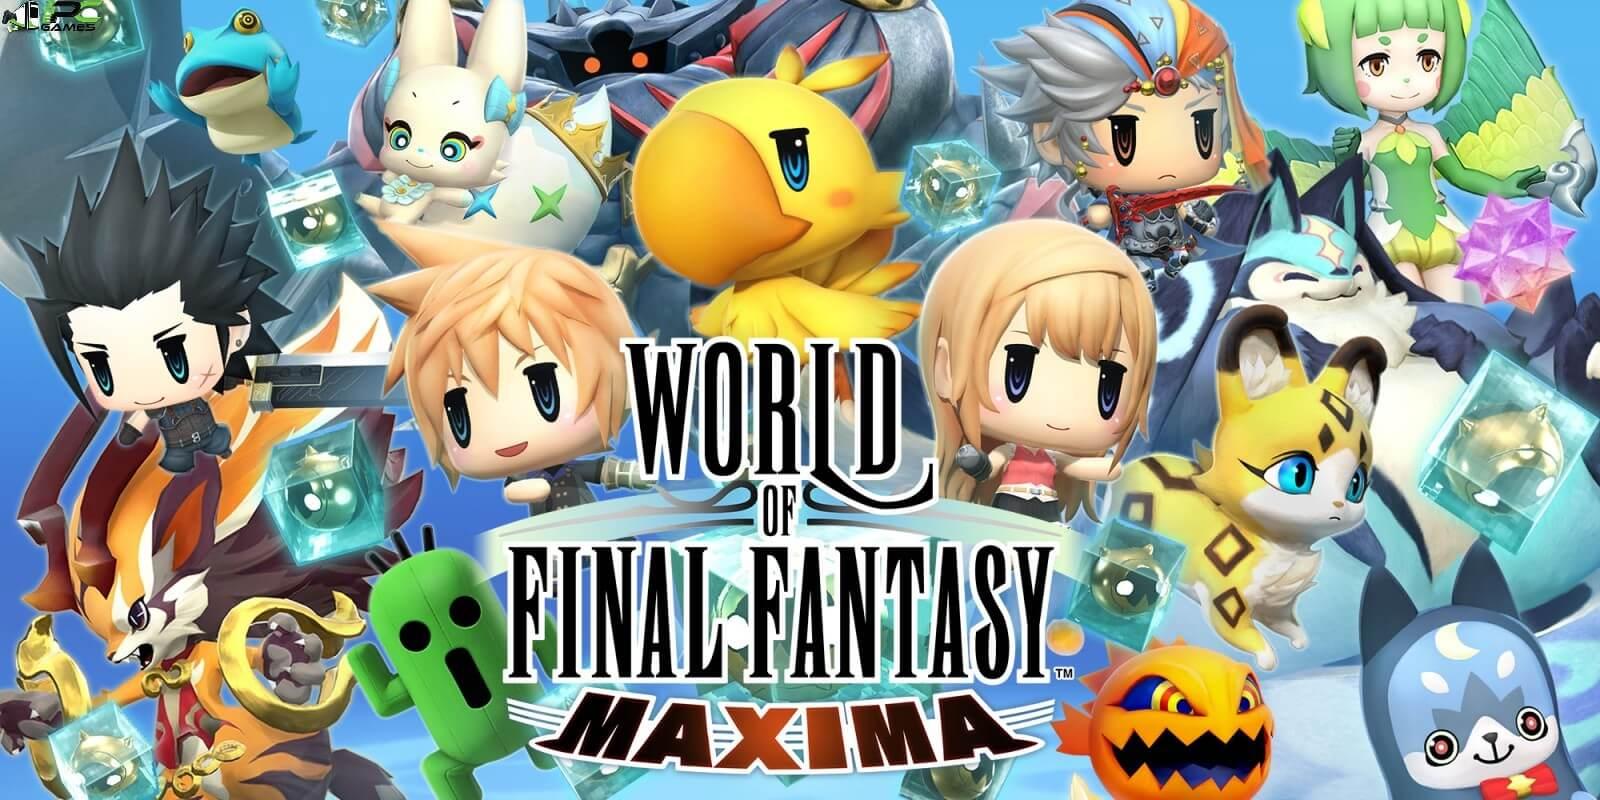 WORLD OF FINAL FANTASY MAXIMA Free Download